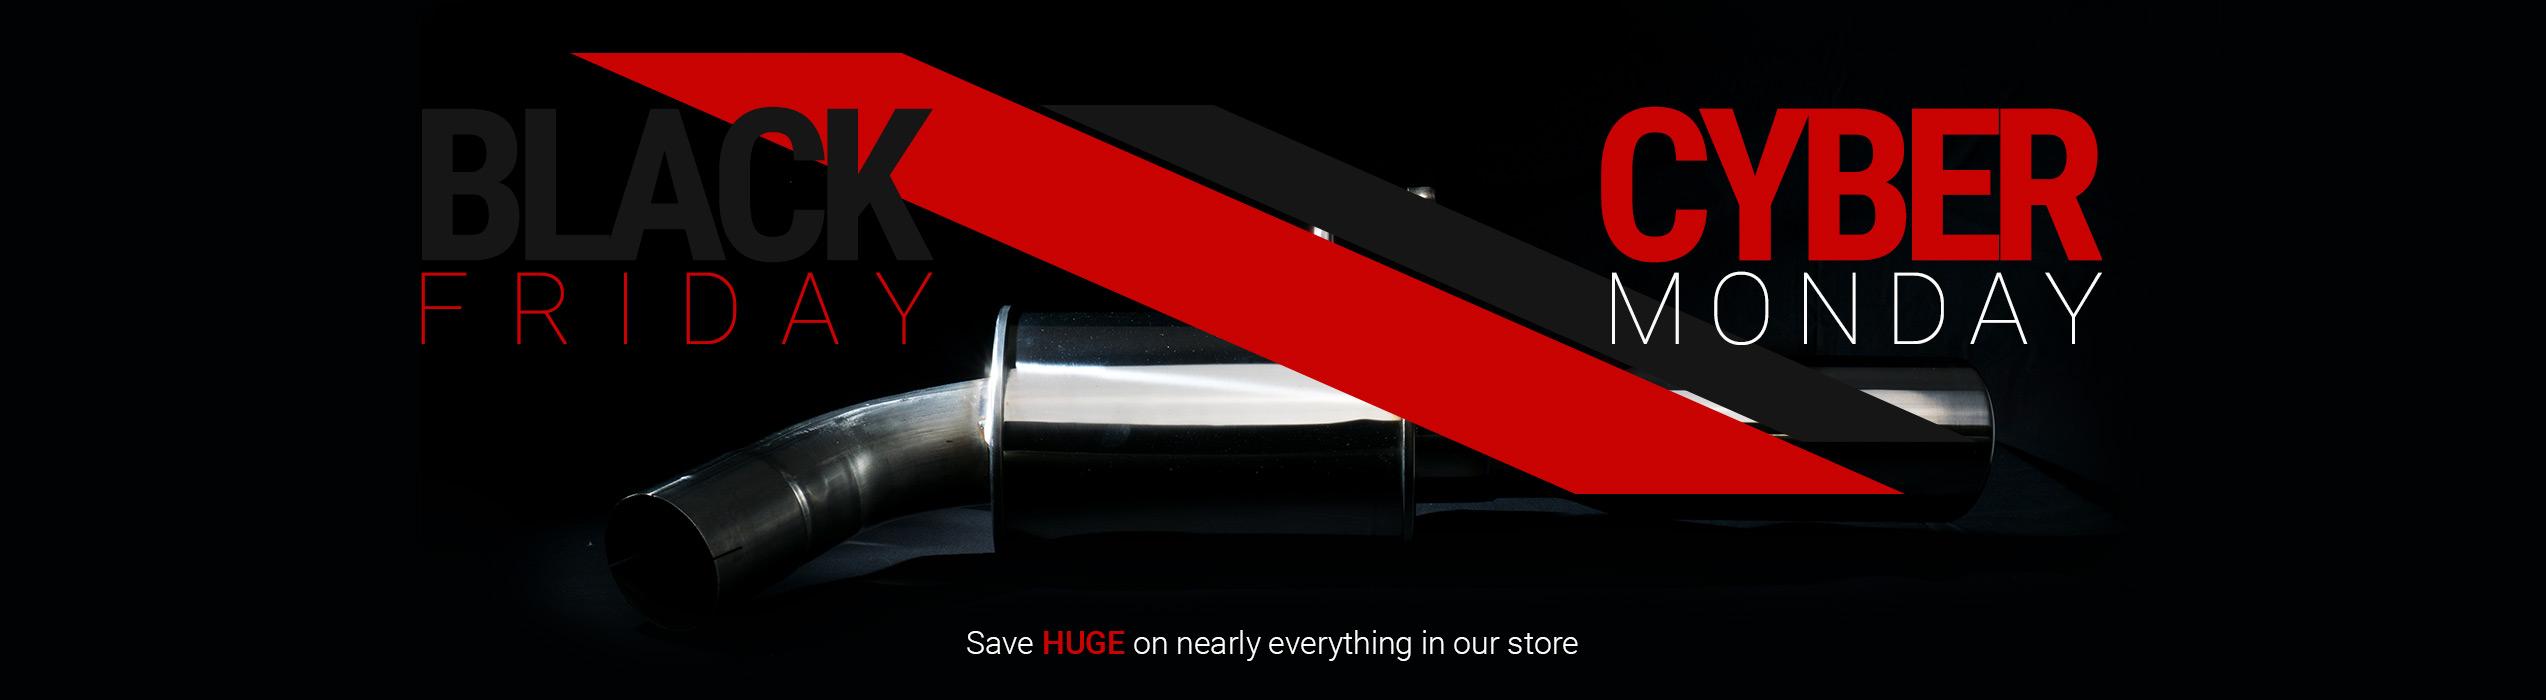 Black Friday - Cyber Monday, save BIG at URD